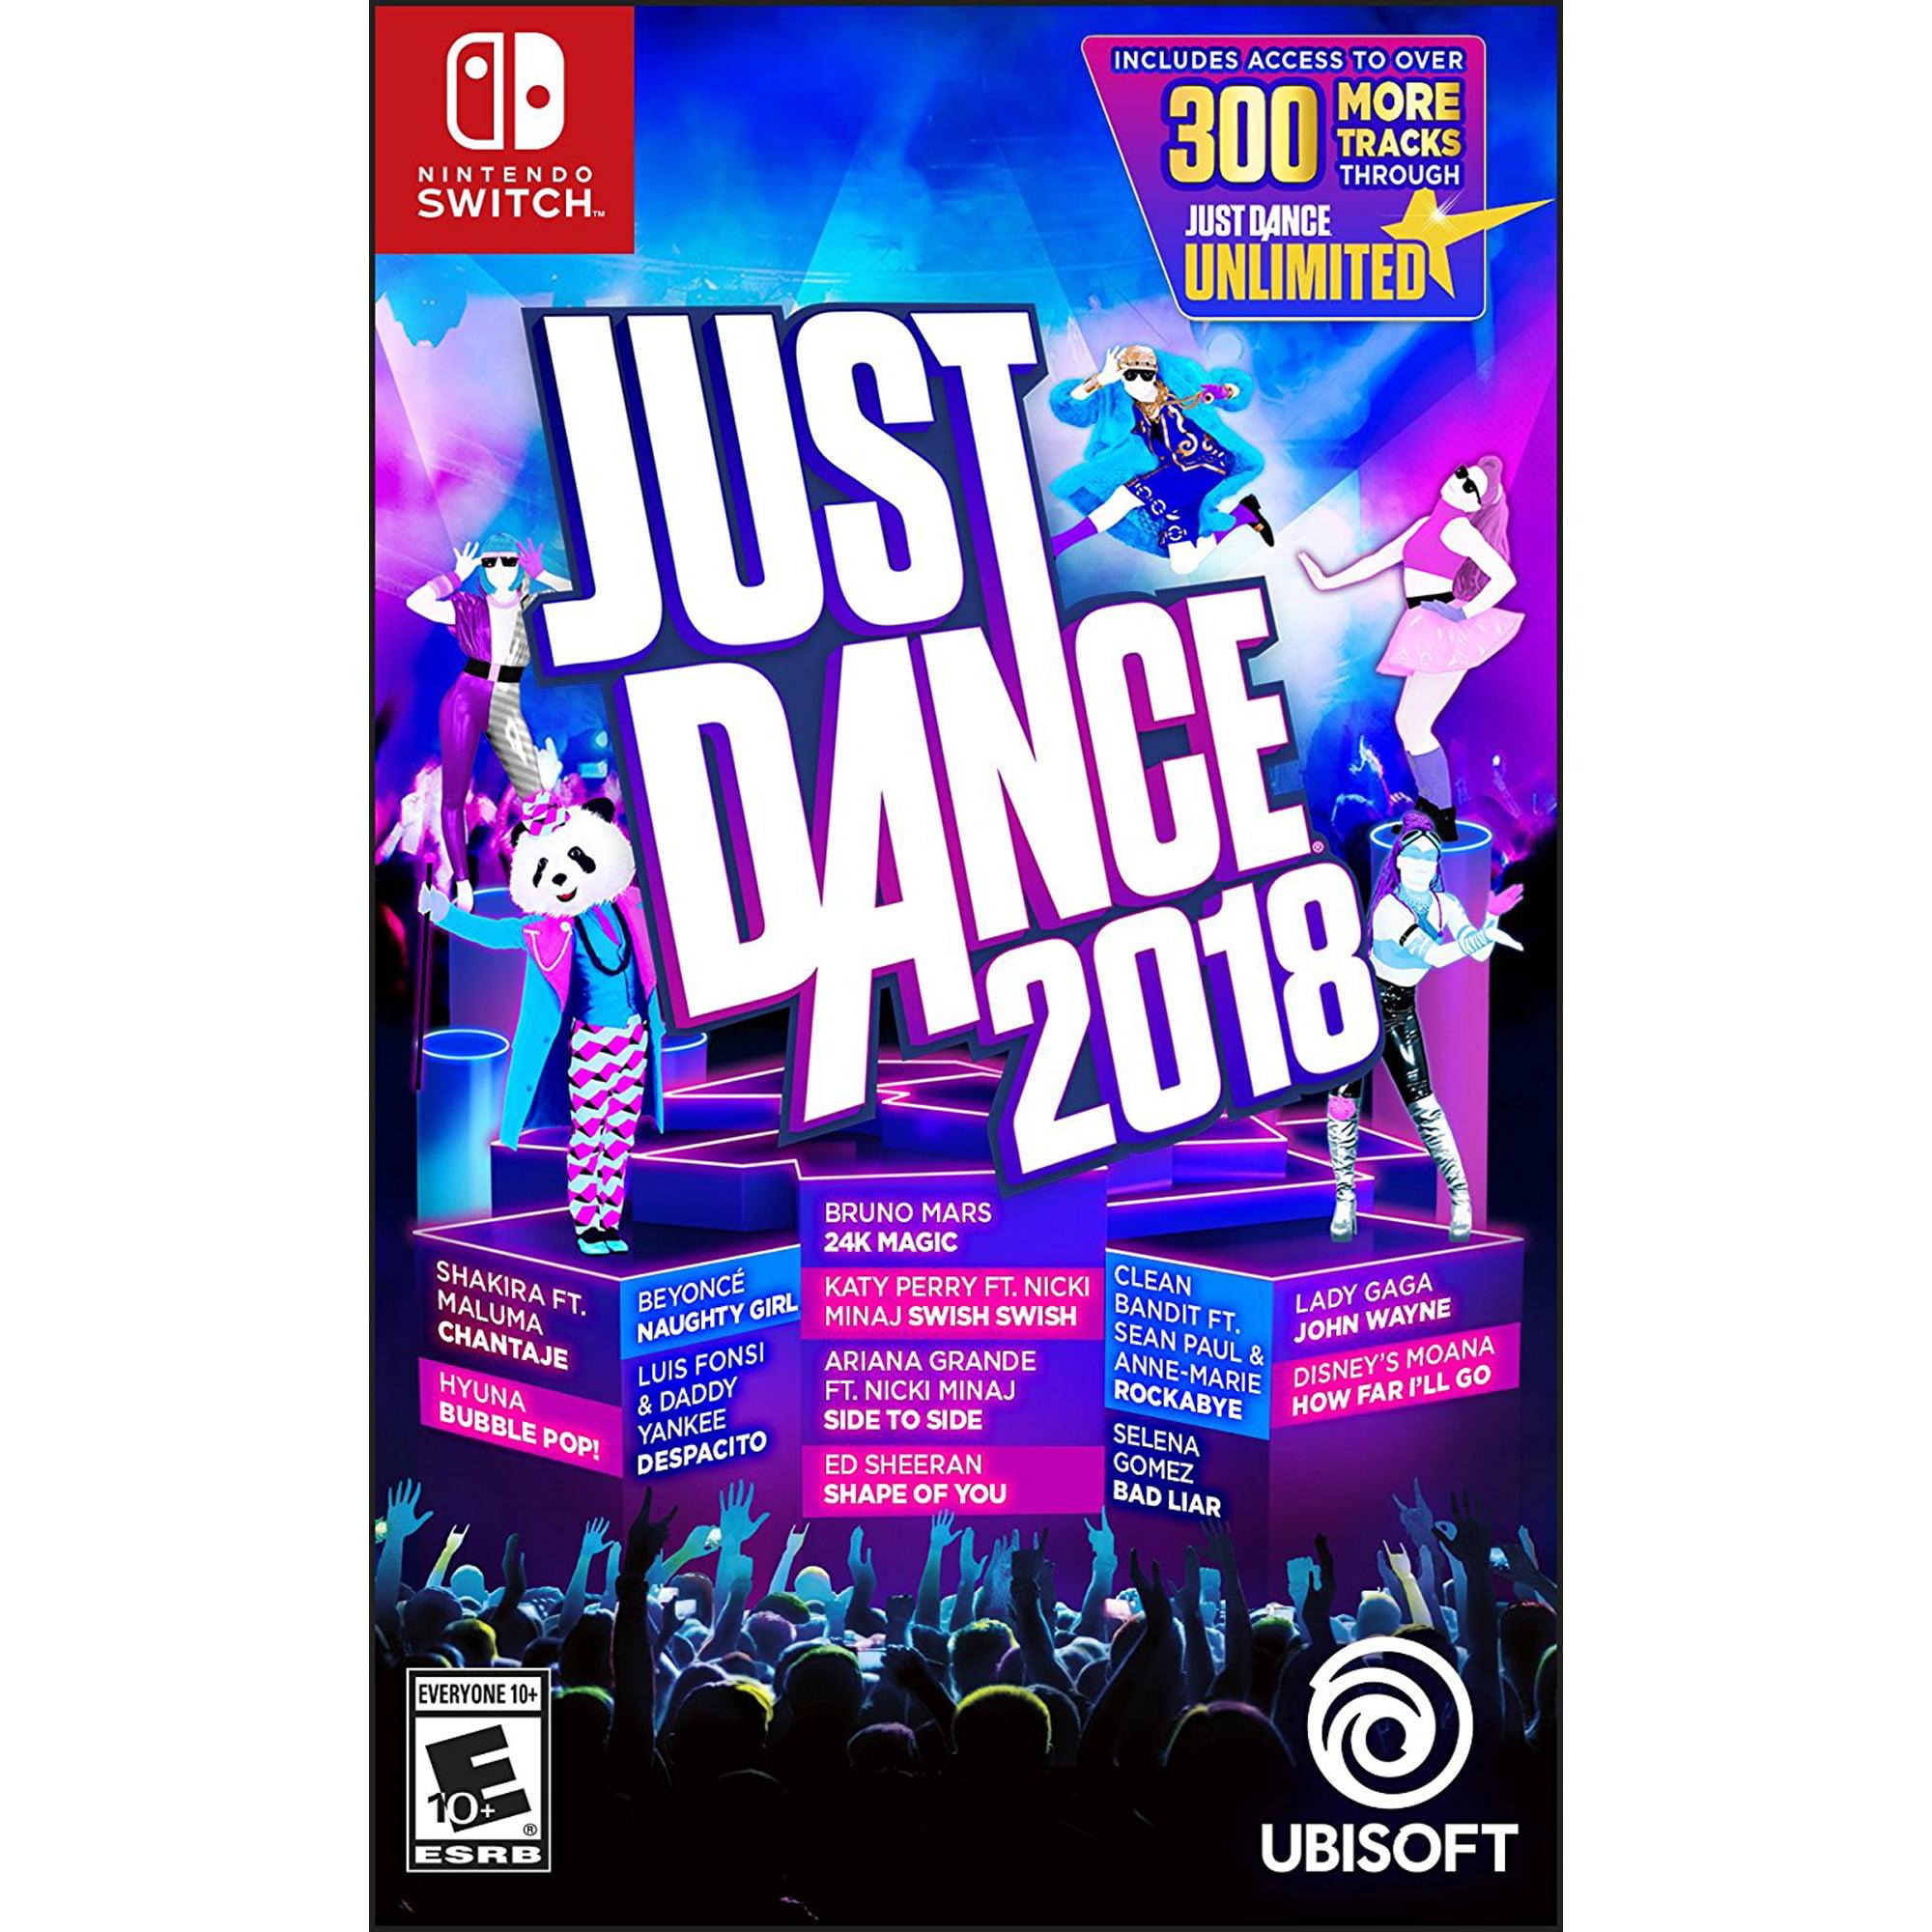 Just Dance 2018 Switch [Digital Download]